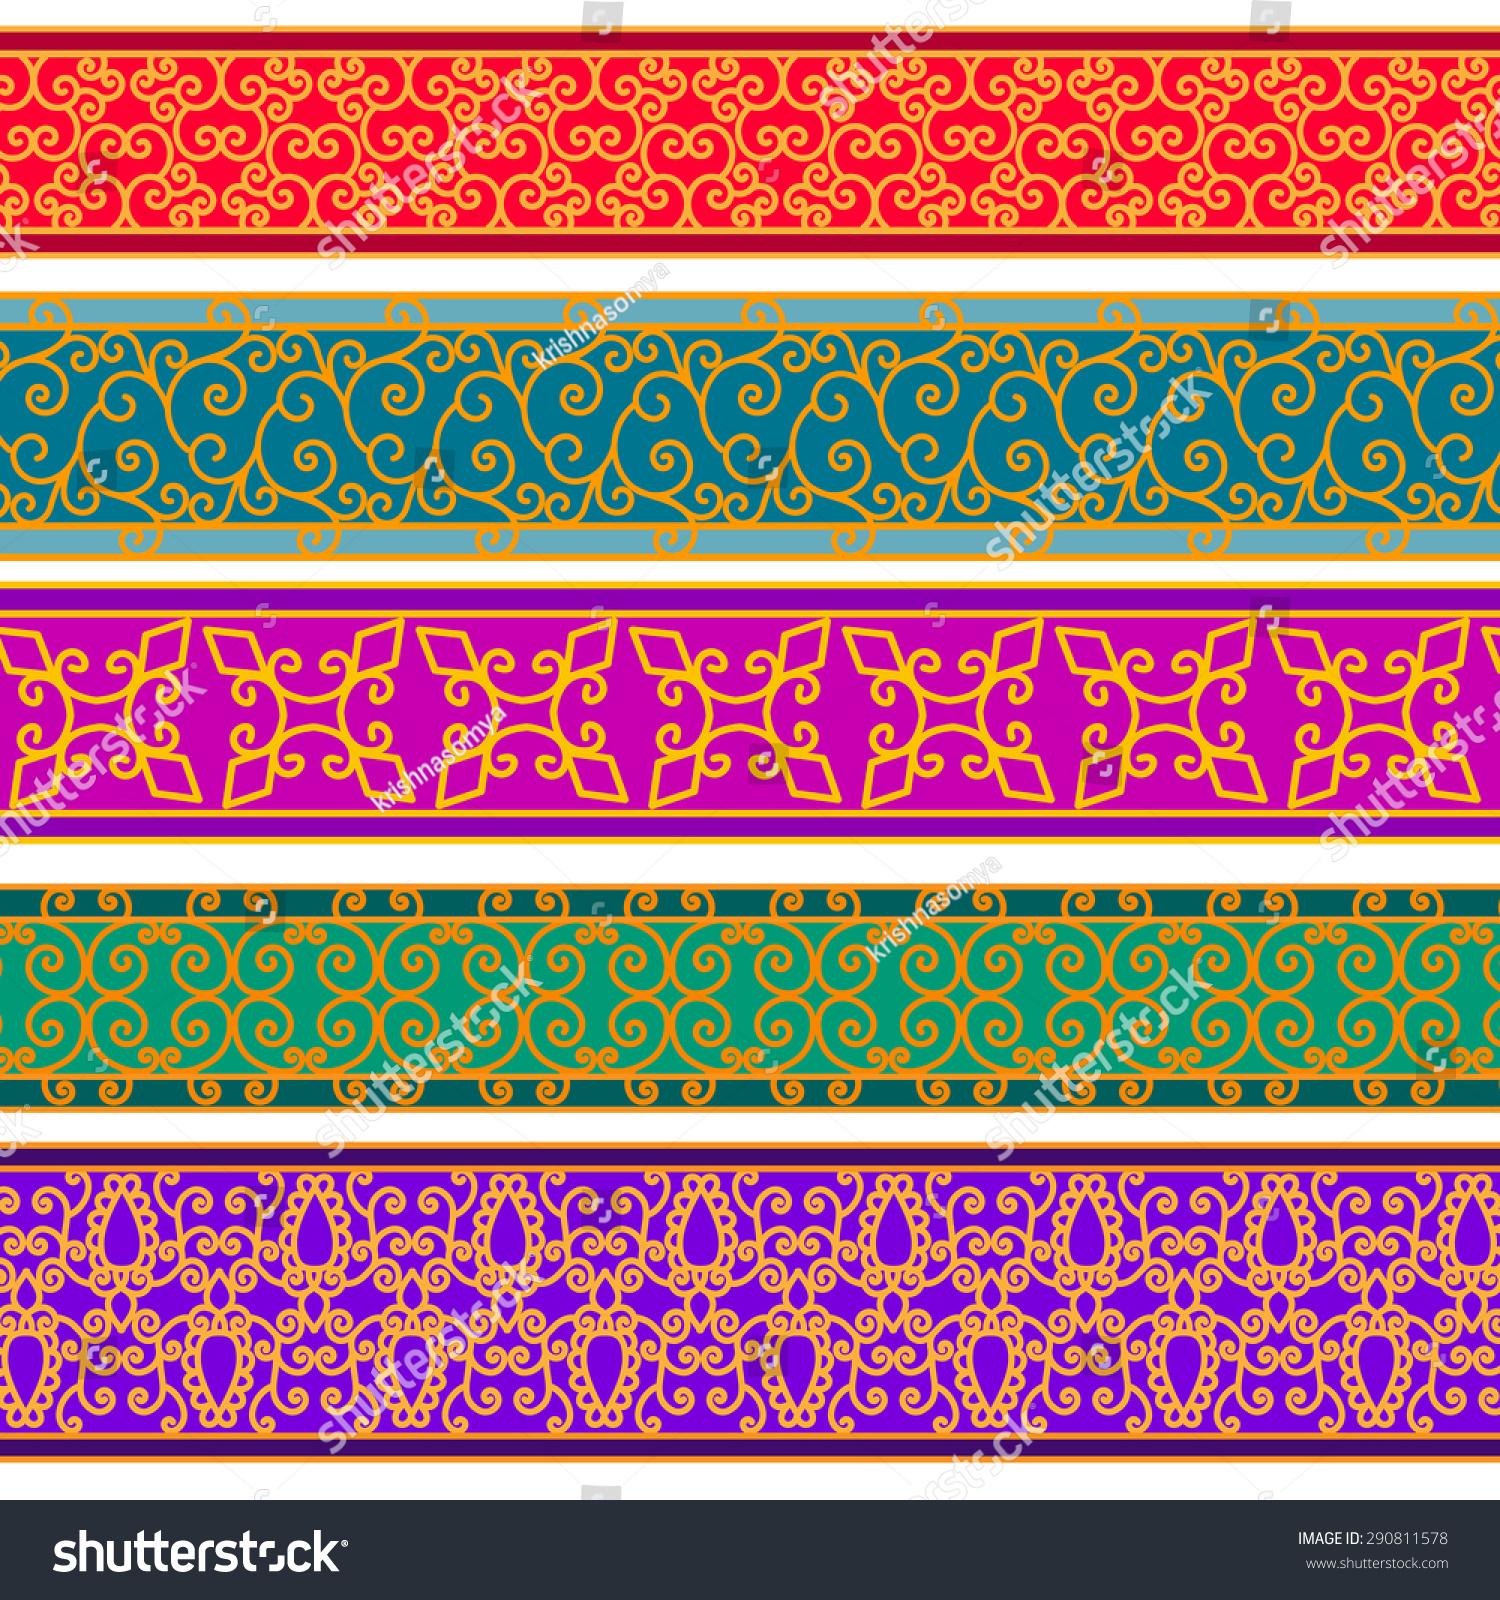 henna inspired banners borders - photo #8